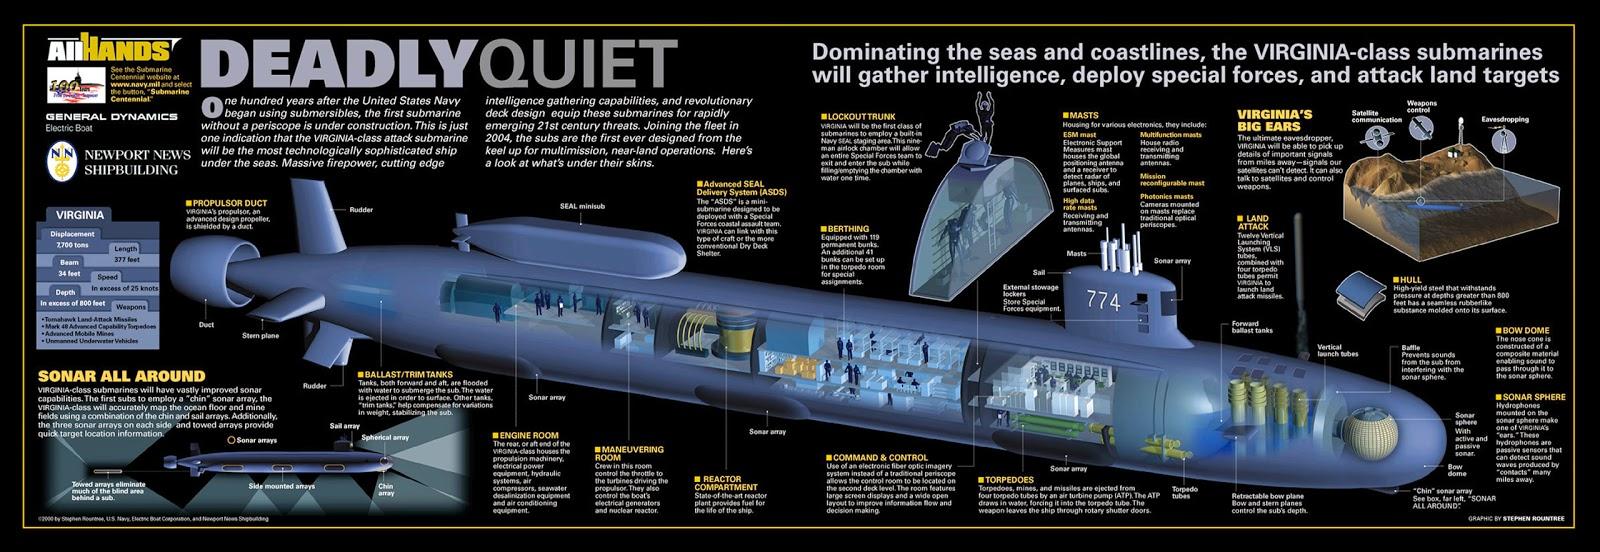 nuclear submarine diagram wiring diagram long nuclear submarine cutaway diagram [ 1600 x 552 Pixel ]